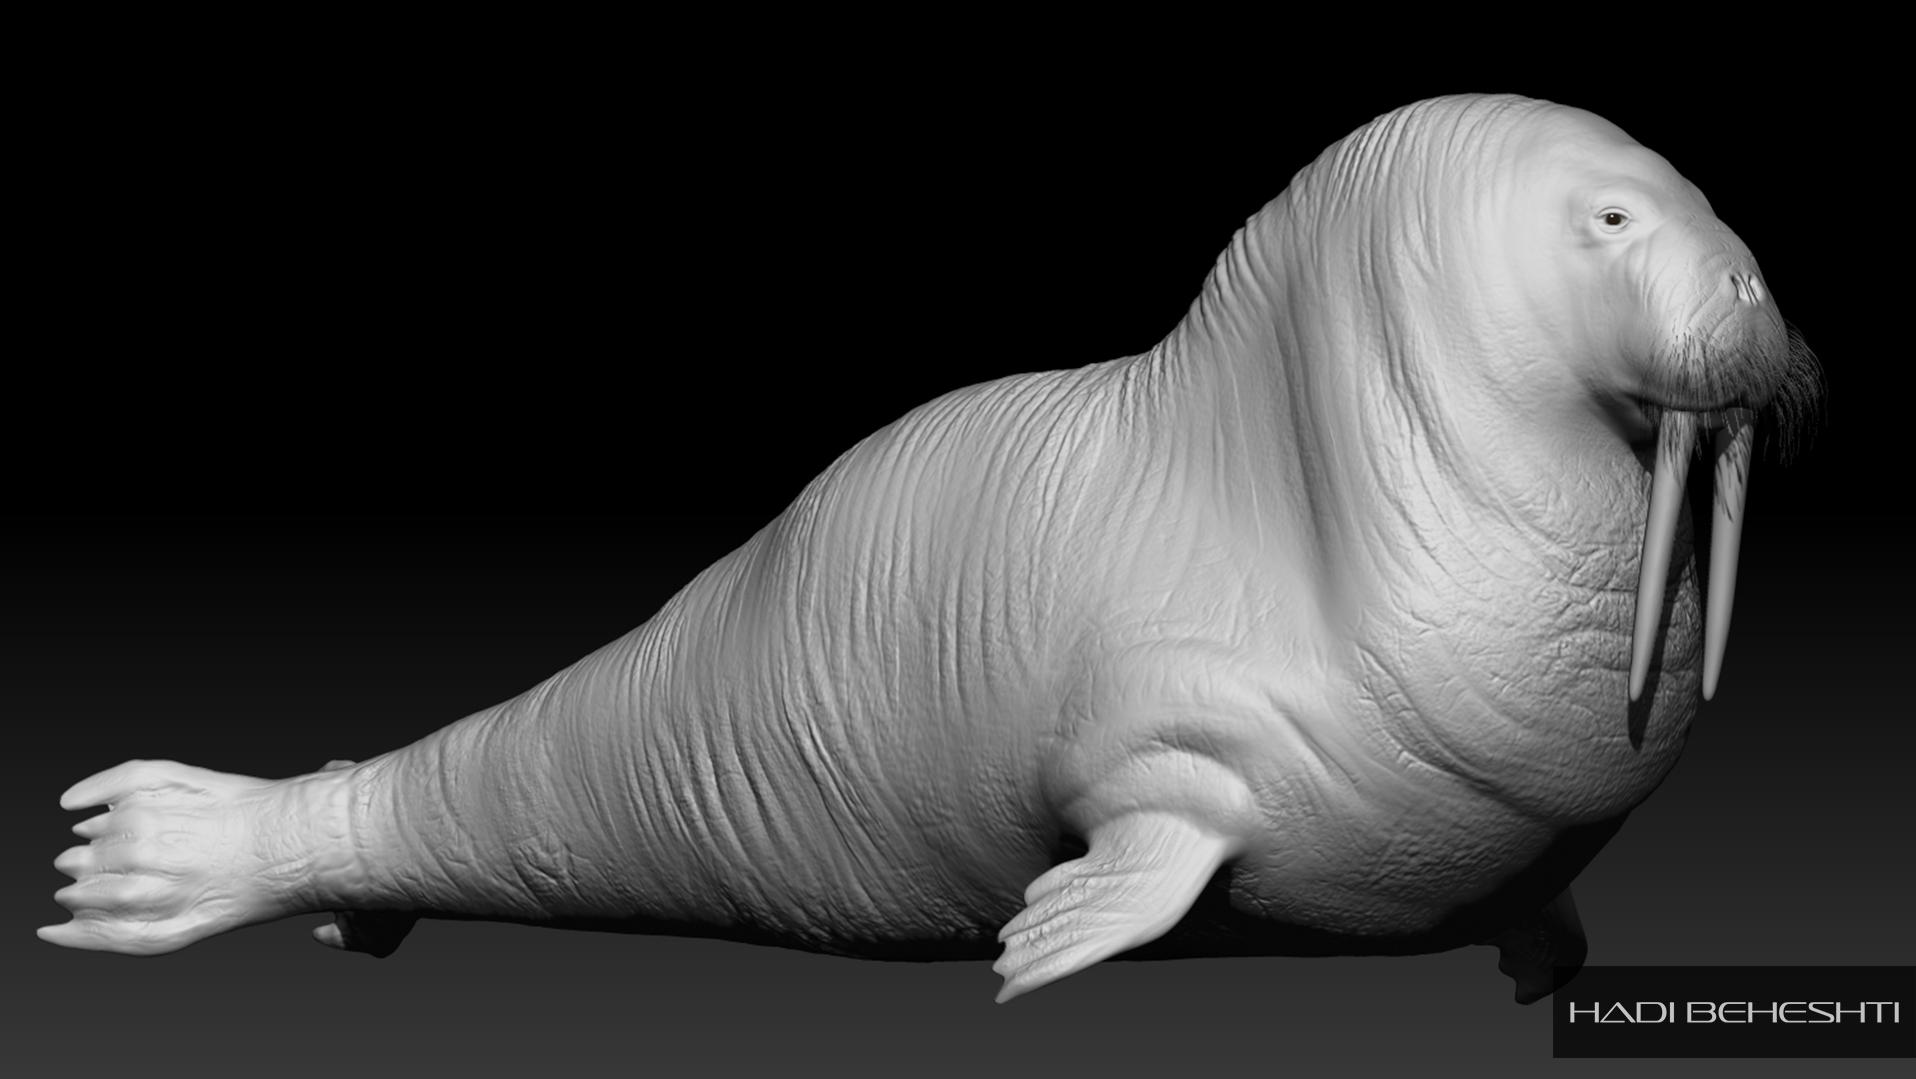 Walrus-2-3d modeling by Hadi Beheshti